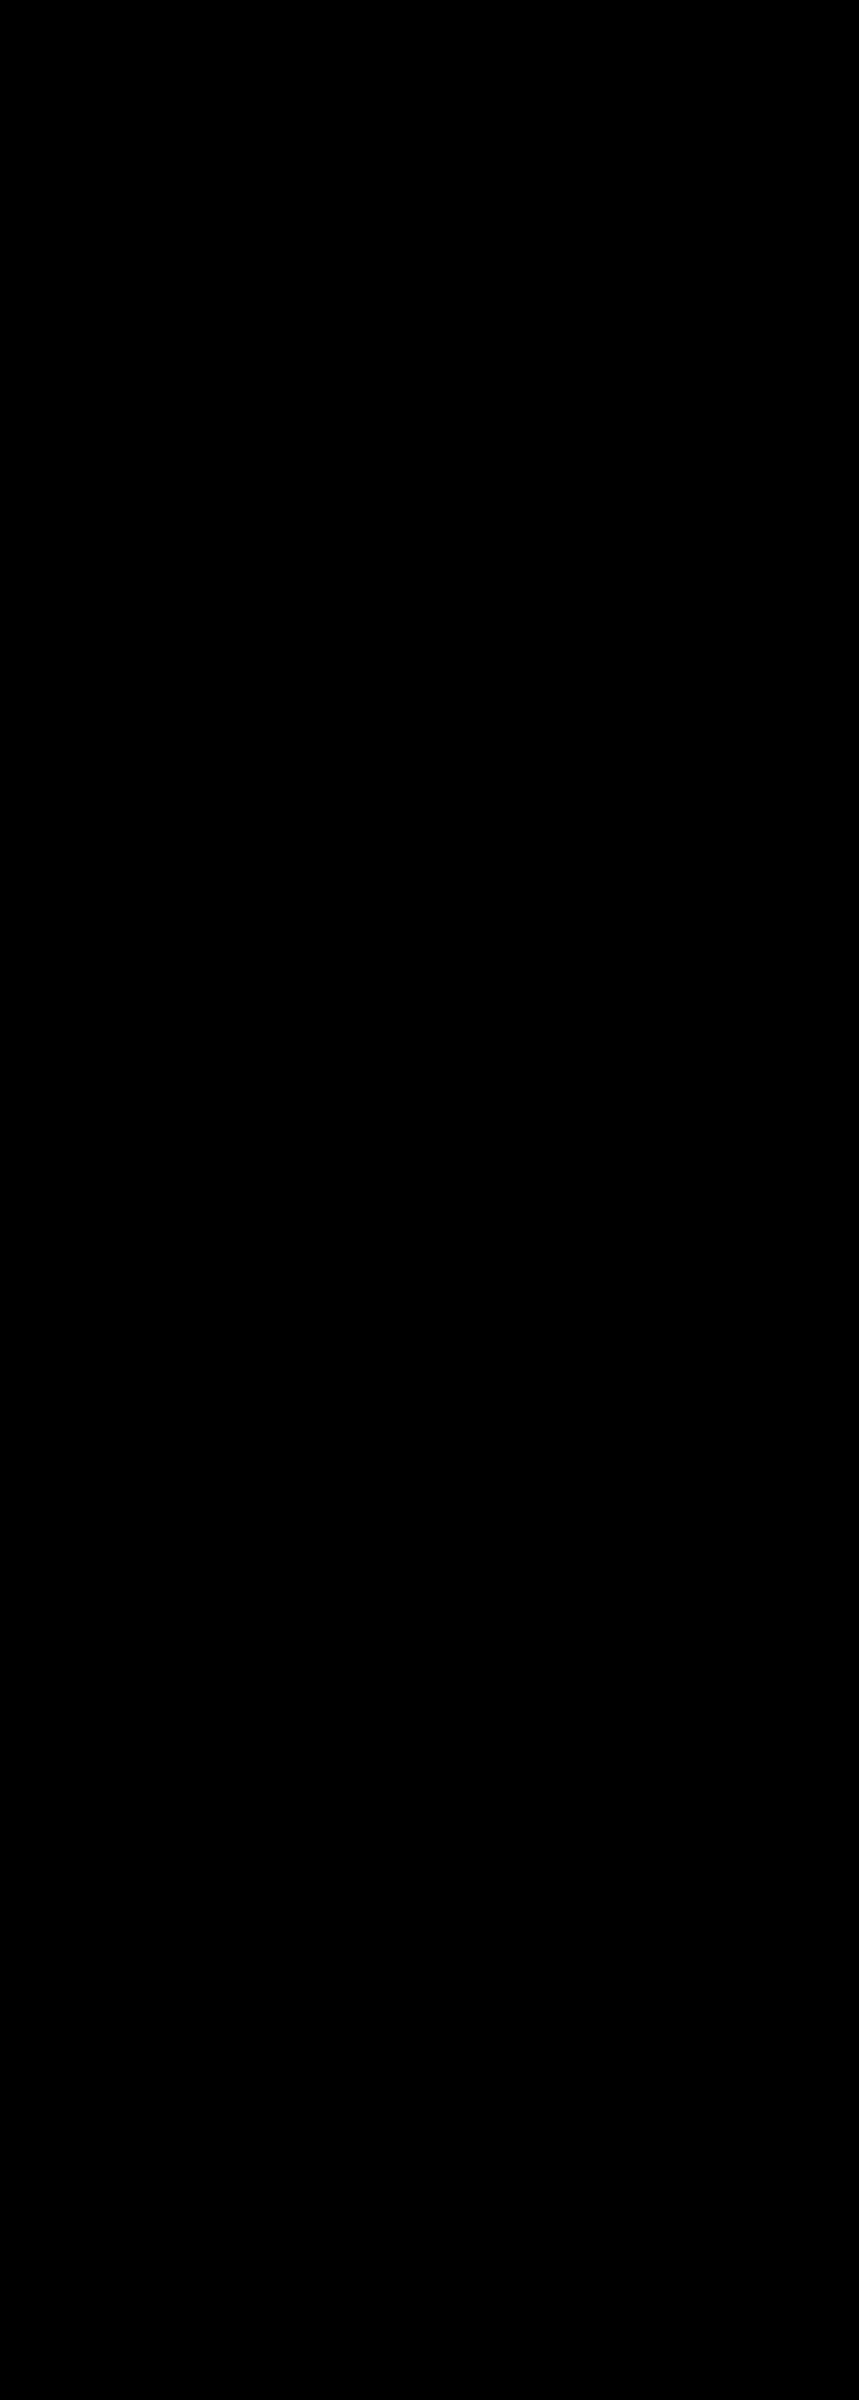 User lambda big image. Human clipart human shape